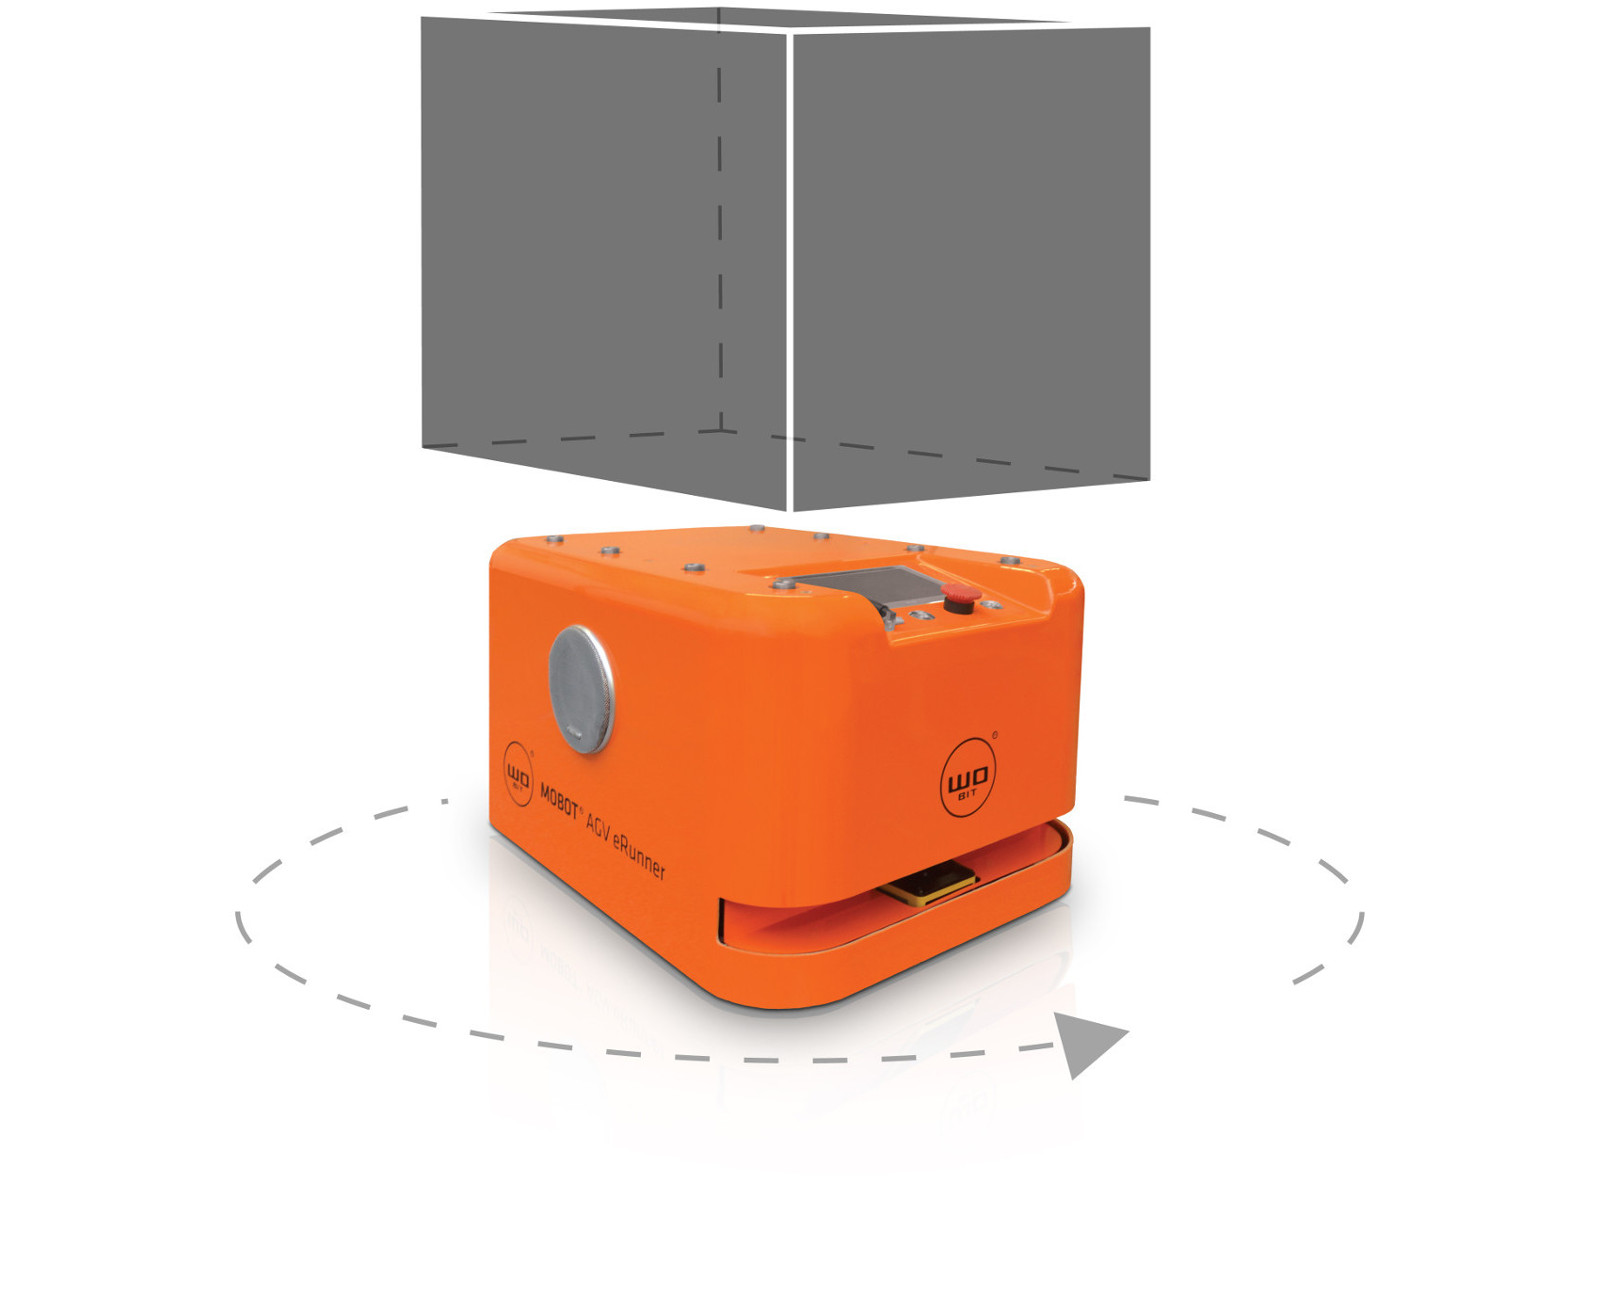 MOBOT® AGV eRunner 003 mobile robot